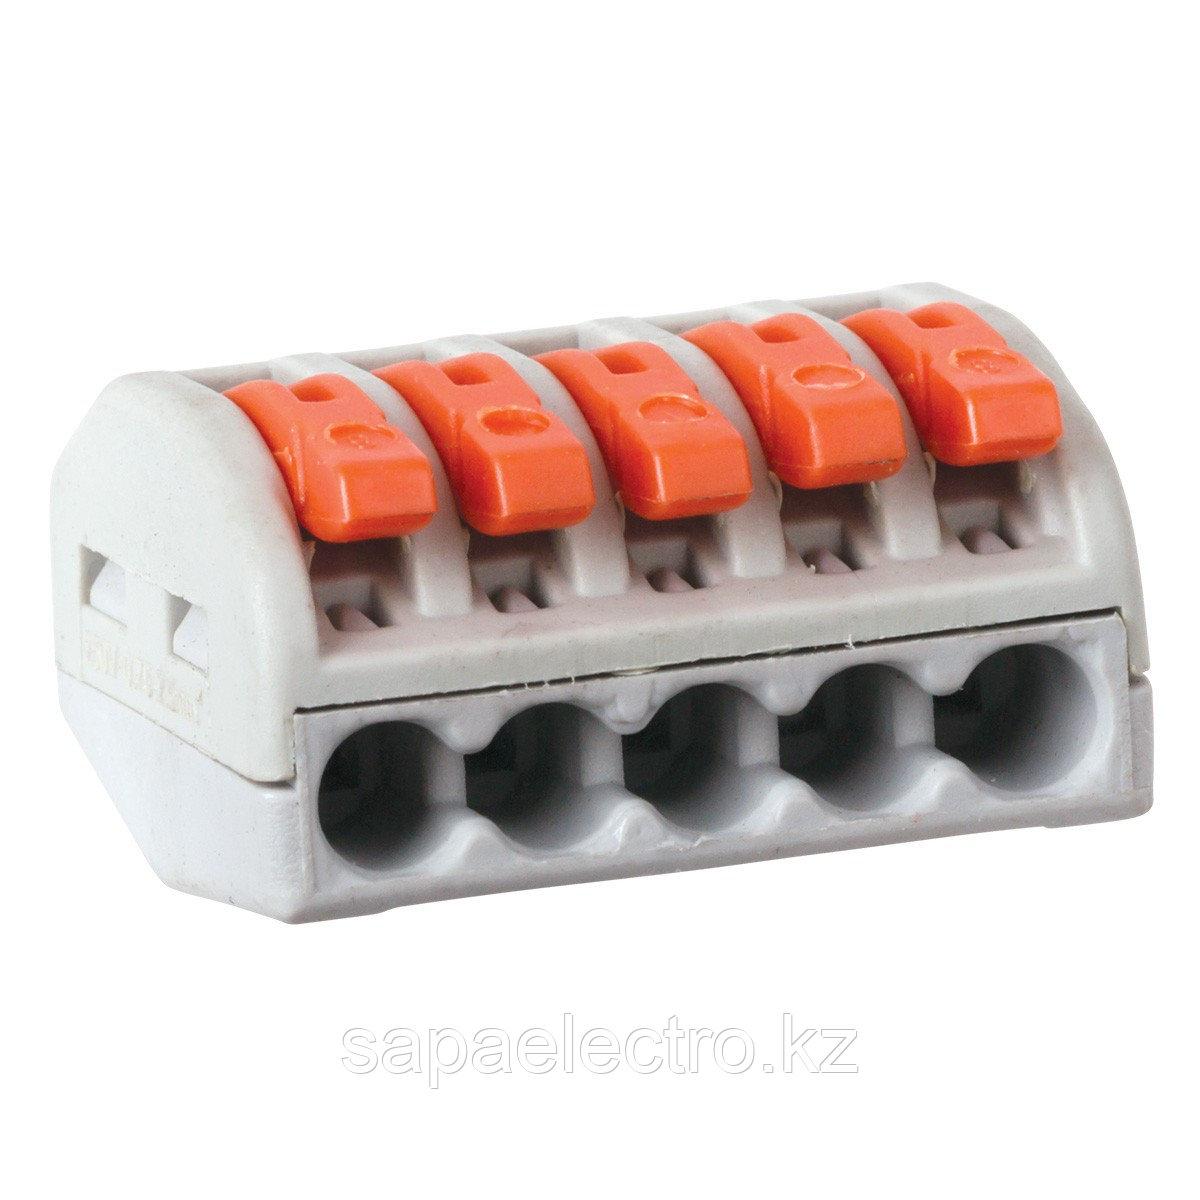 PCT258105  Монтажн. экспресс-клемма100шт